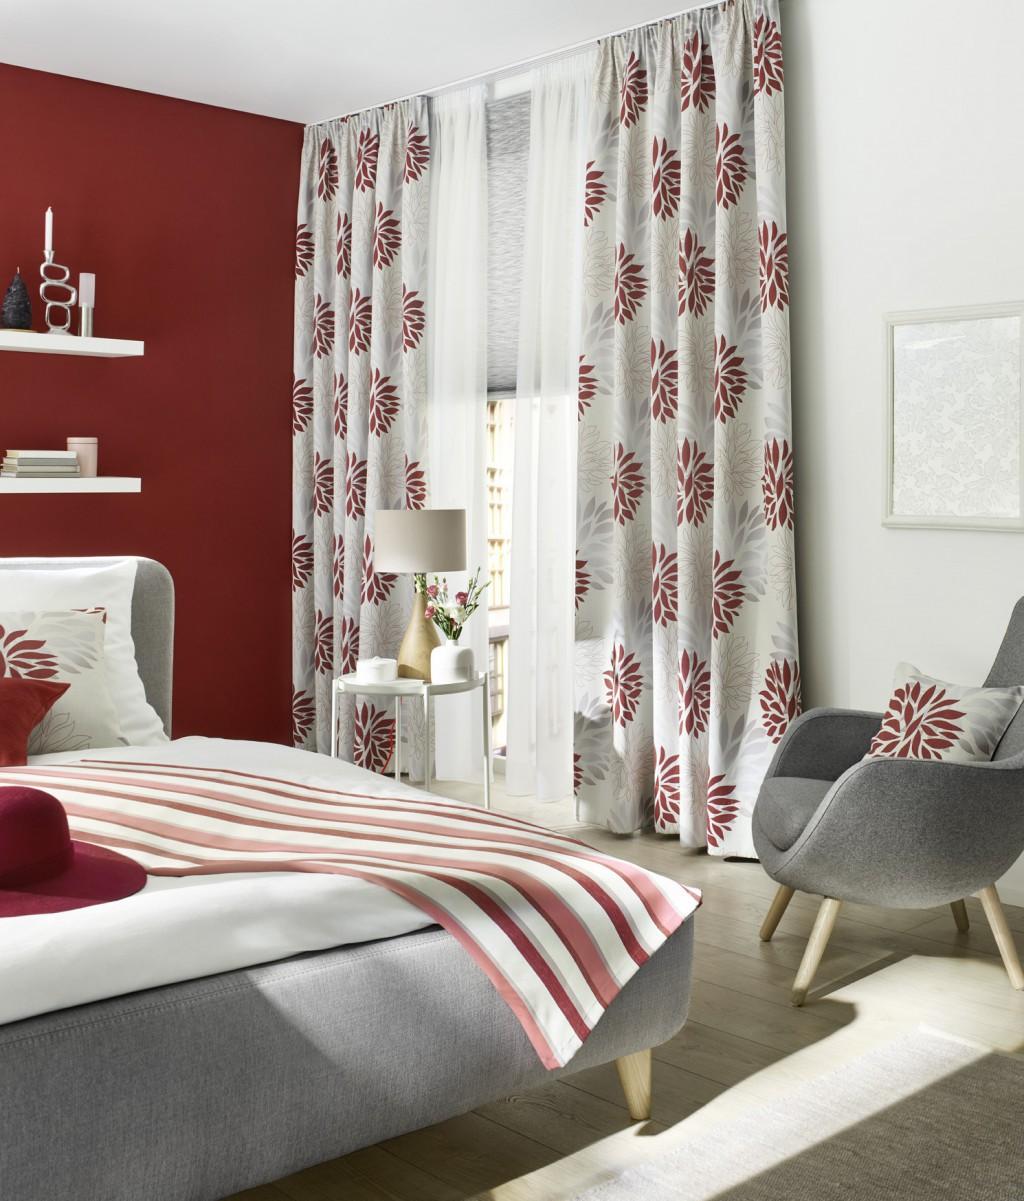 raumausstatter harald geweke. Black Bedroom Furniture Sets. Home Design Ideas